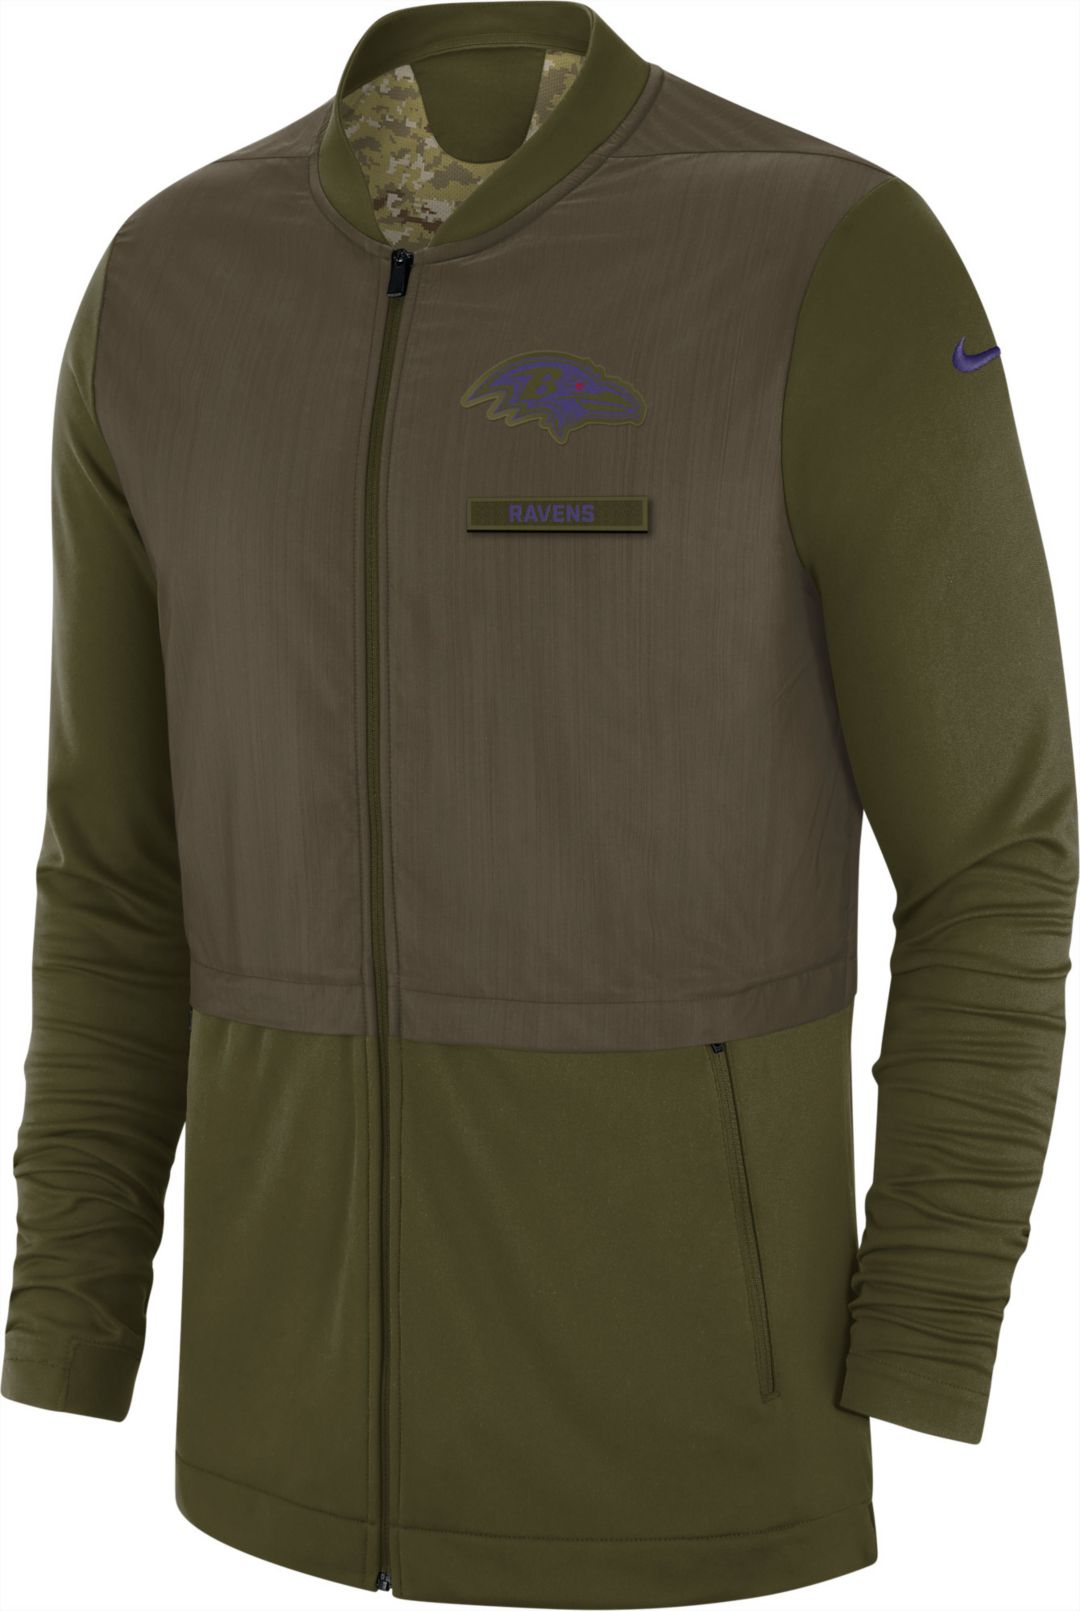 3c11e074 Nike Men's Salute to Service Baltimore Ravens Hybrid Full-Zip Jacket